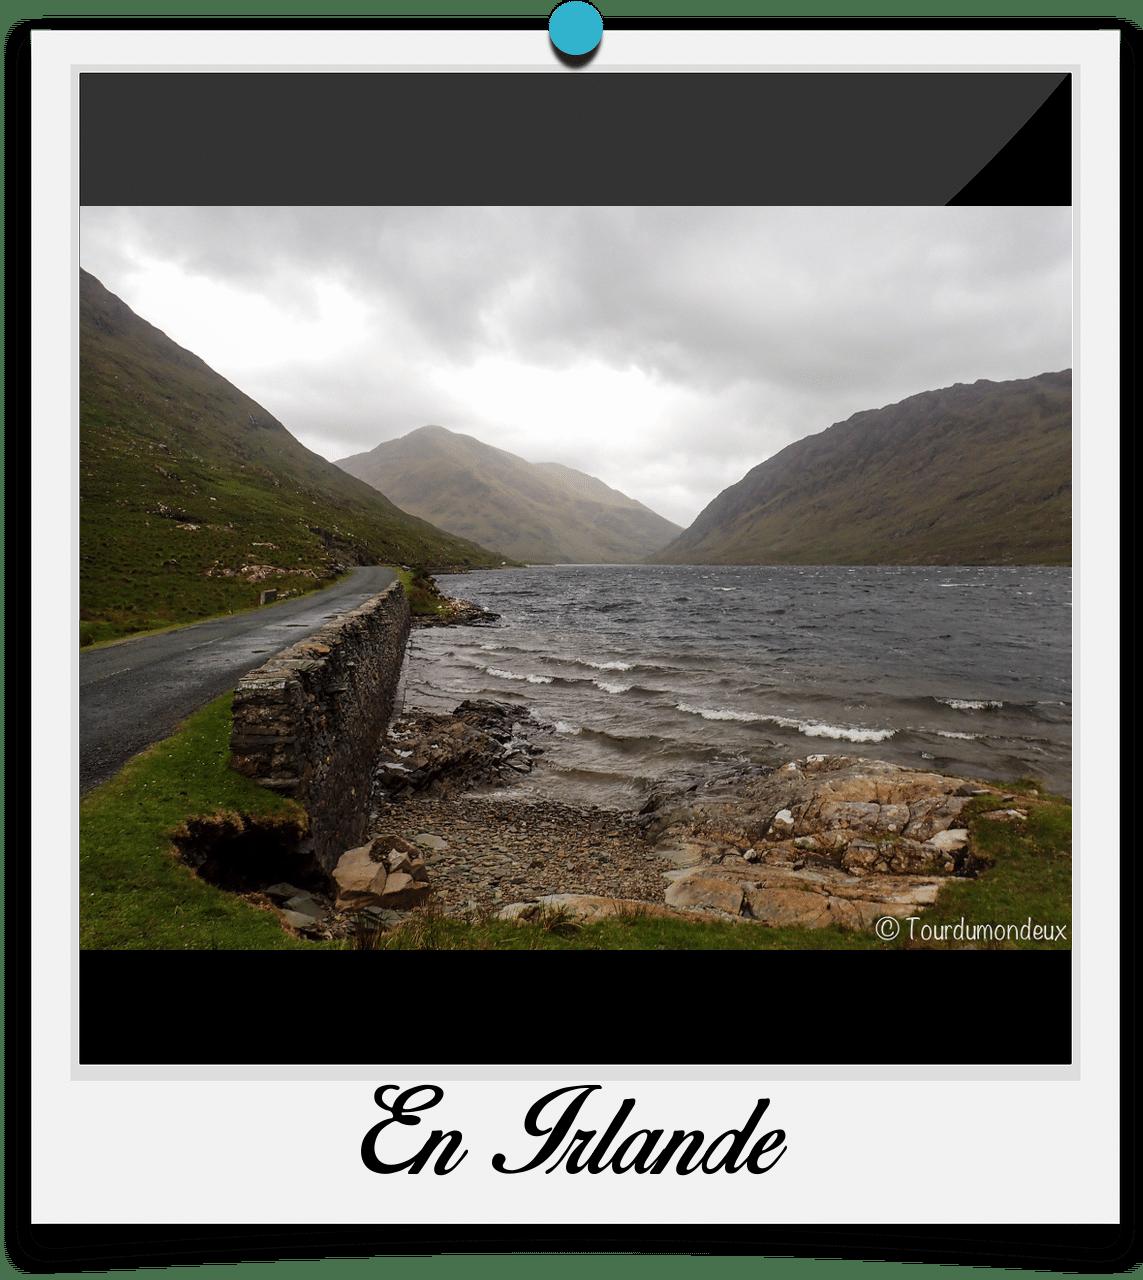 irlande-tourdumondeux